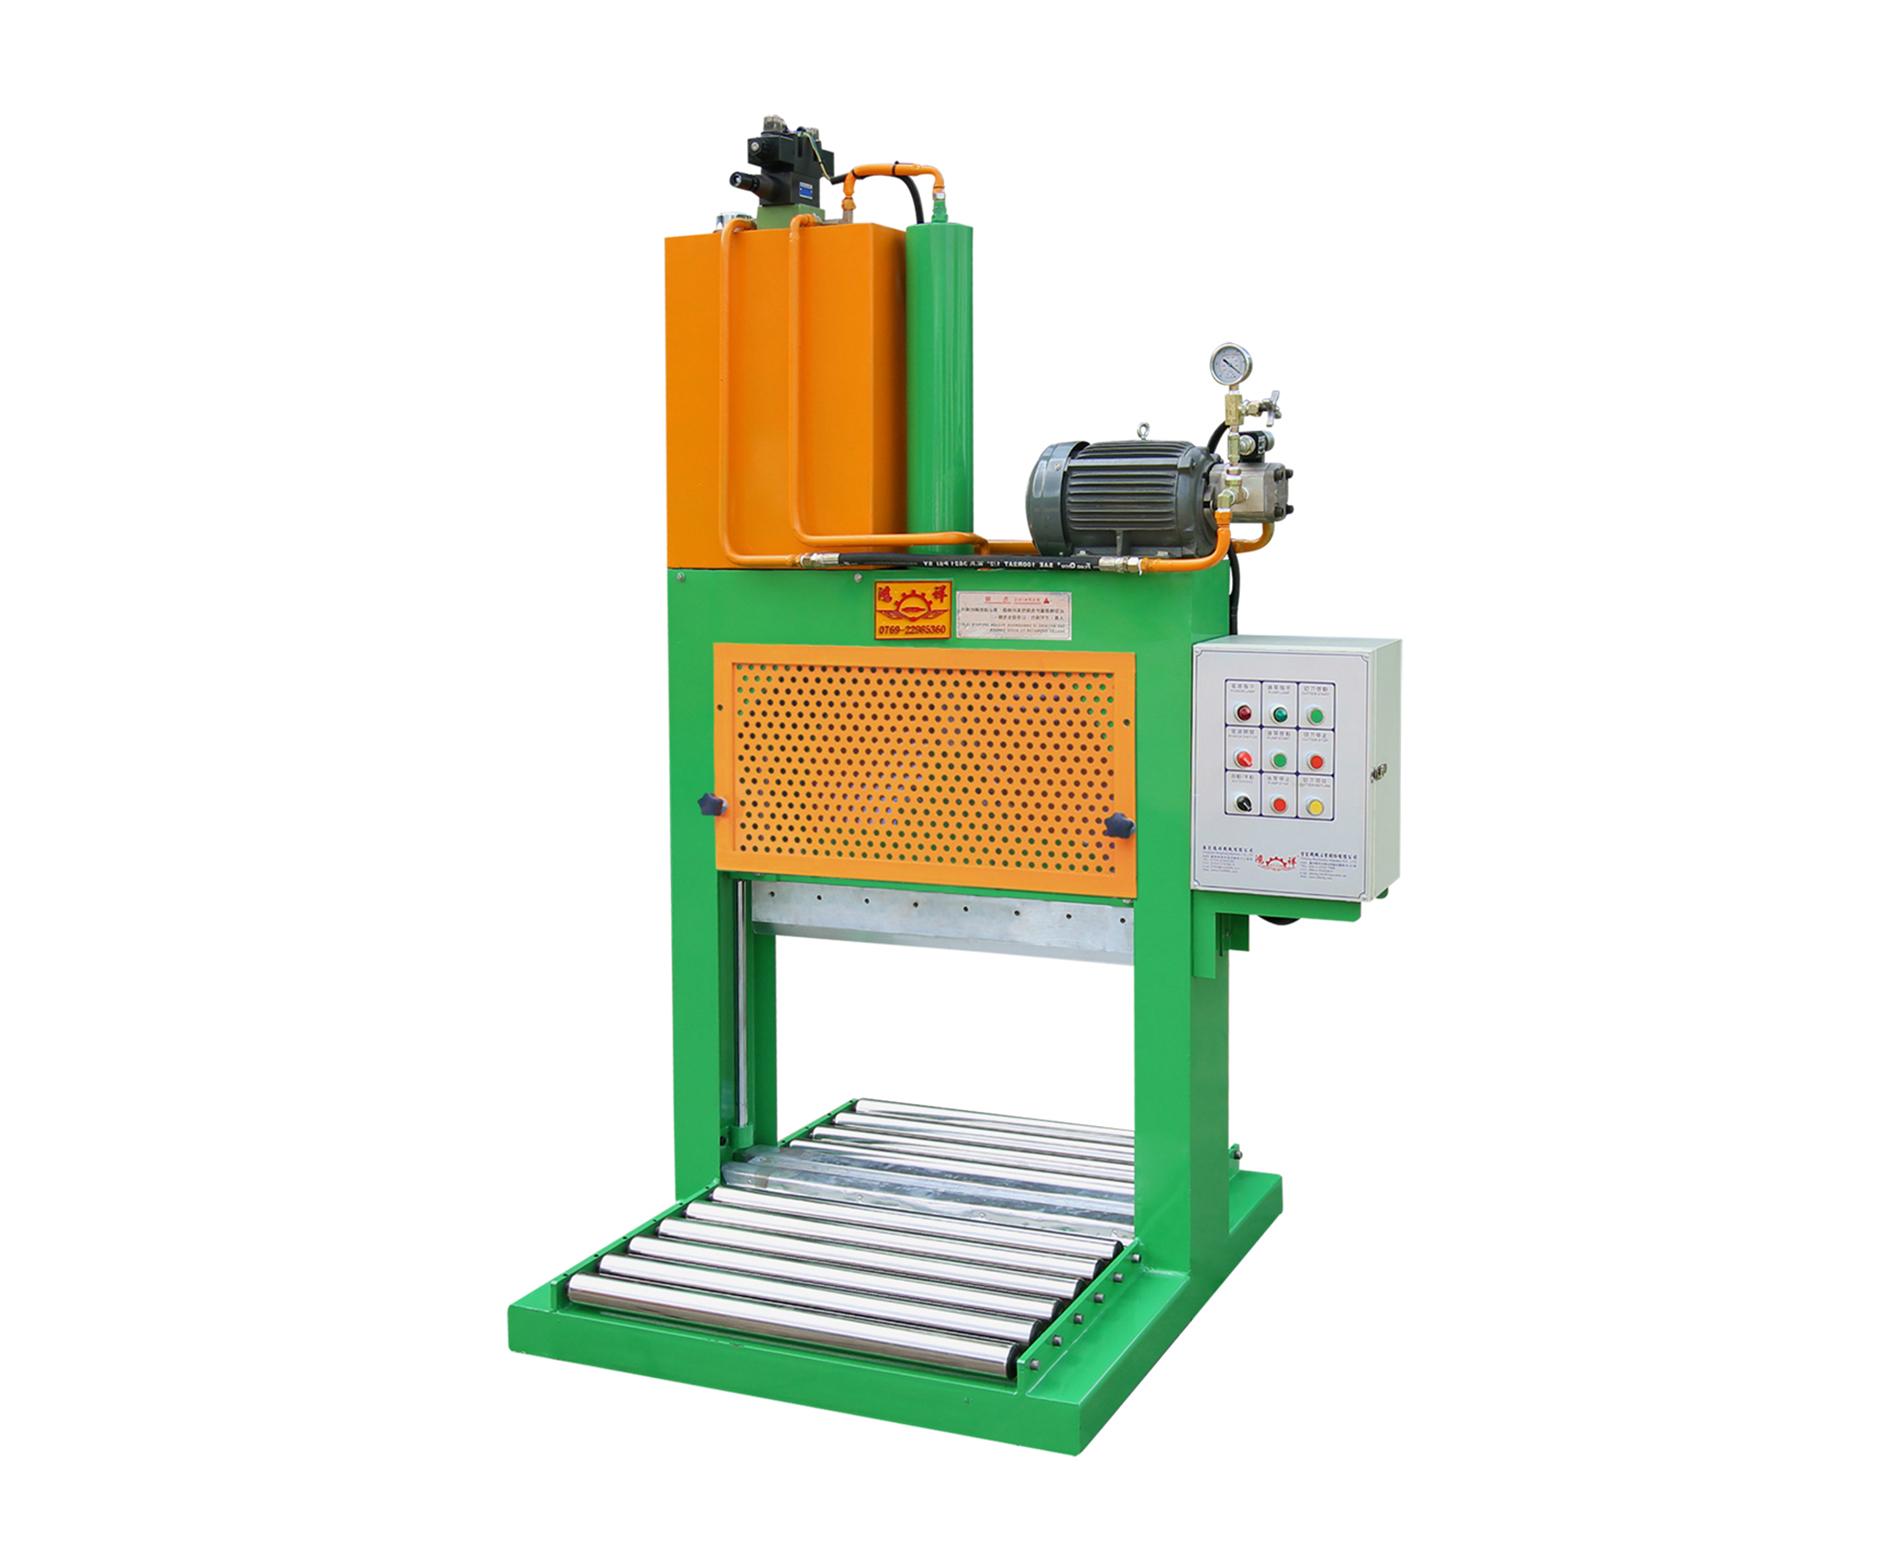 HX-81071 油压自动切胶机